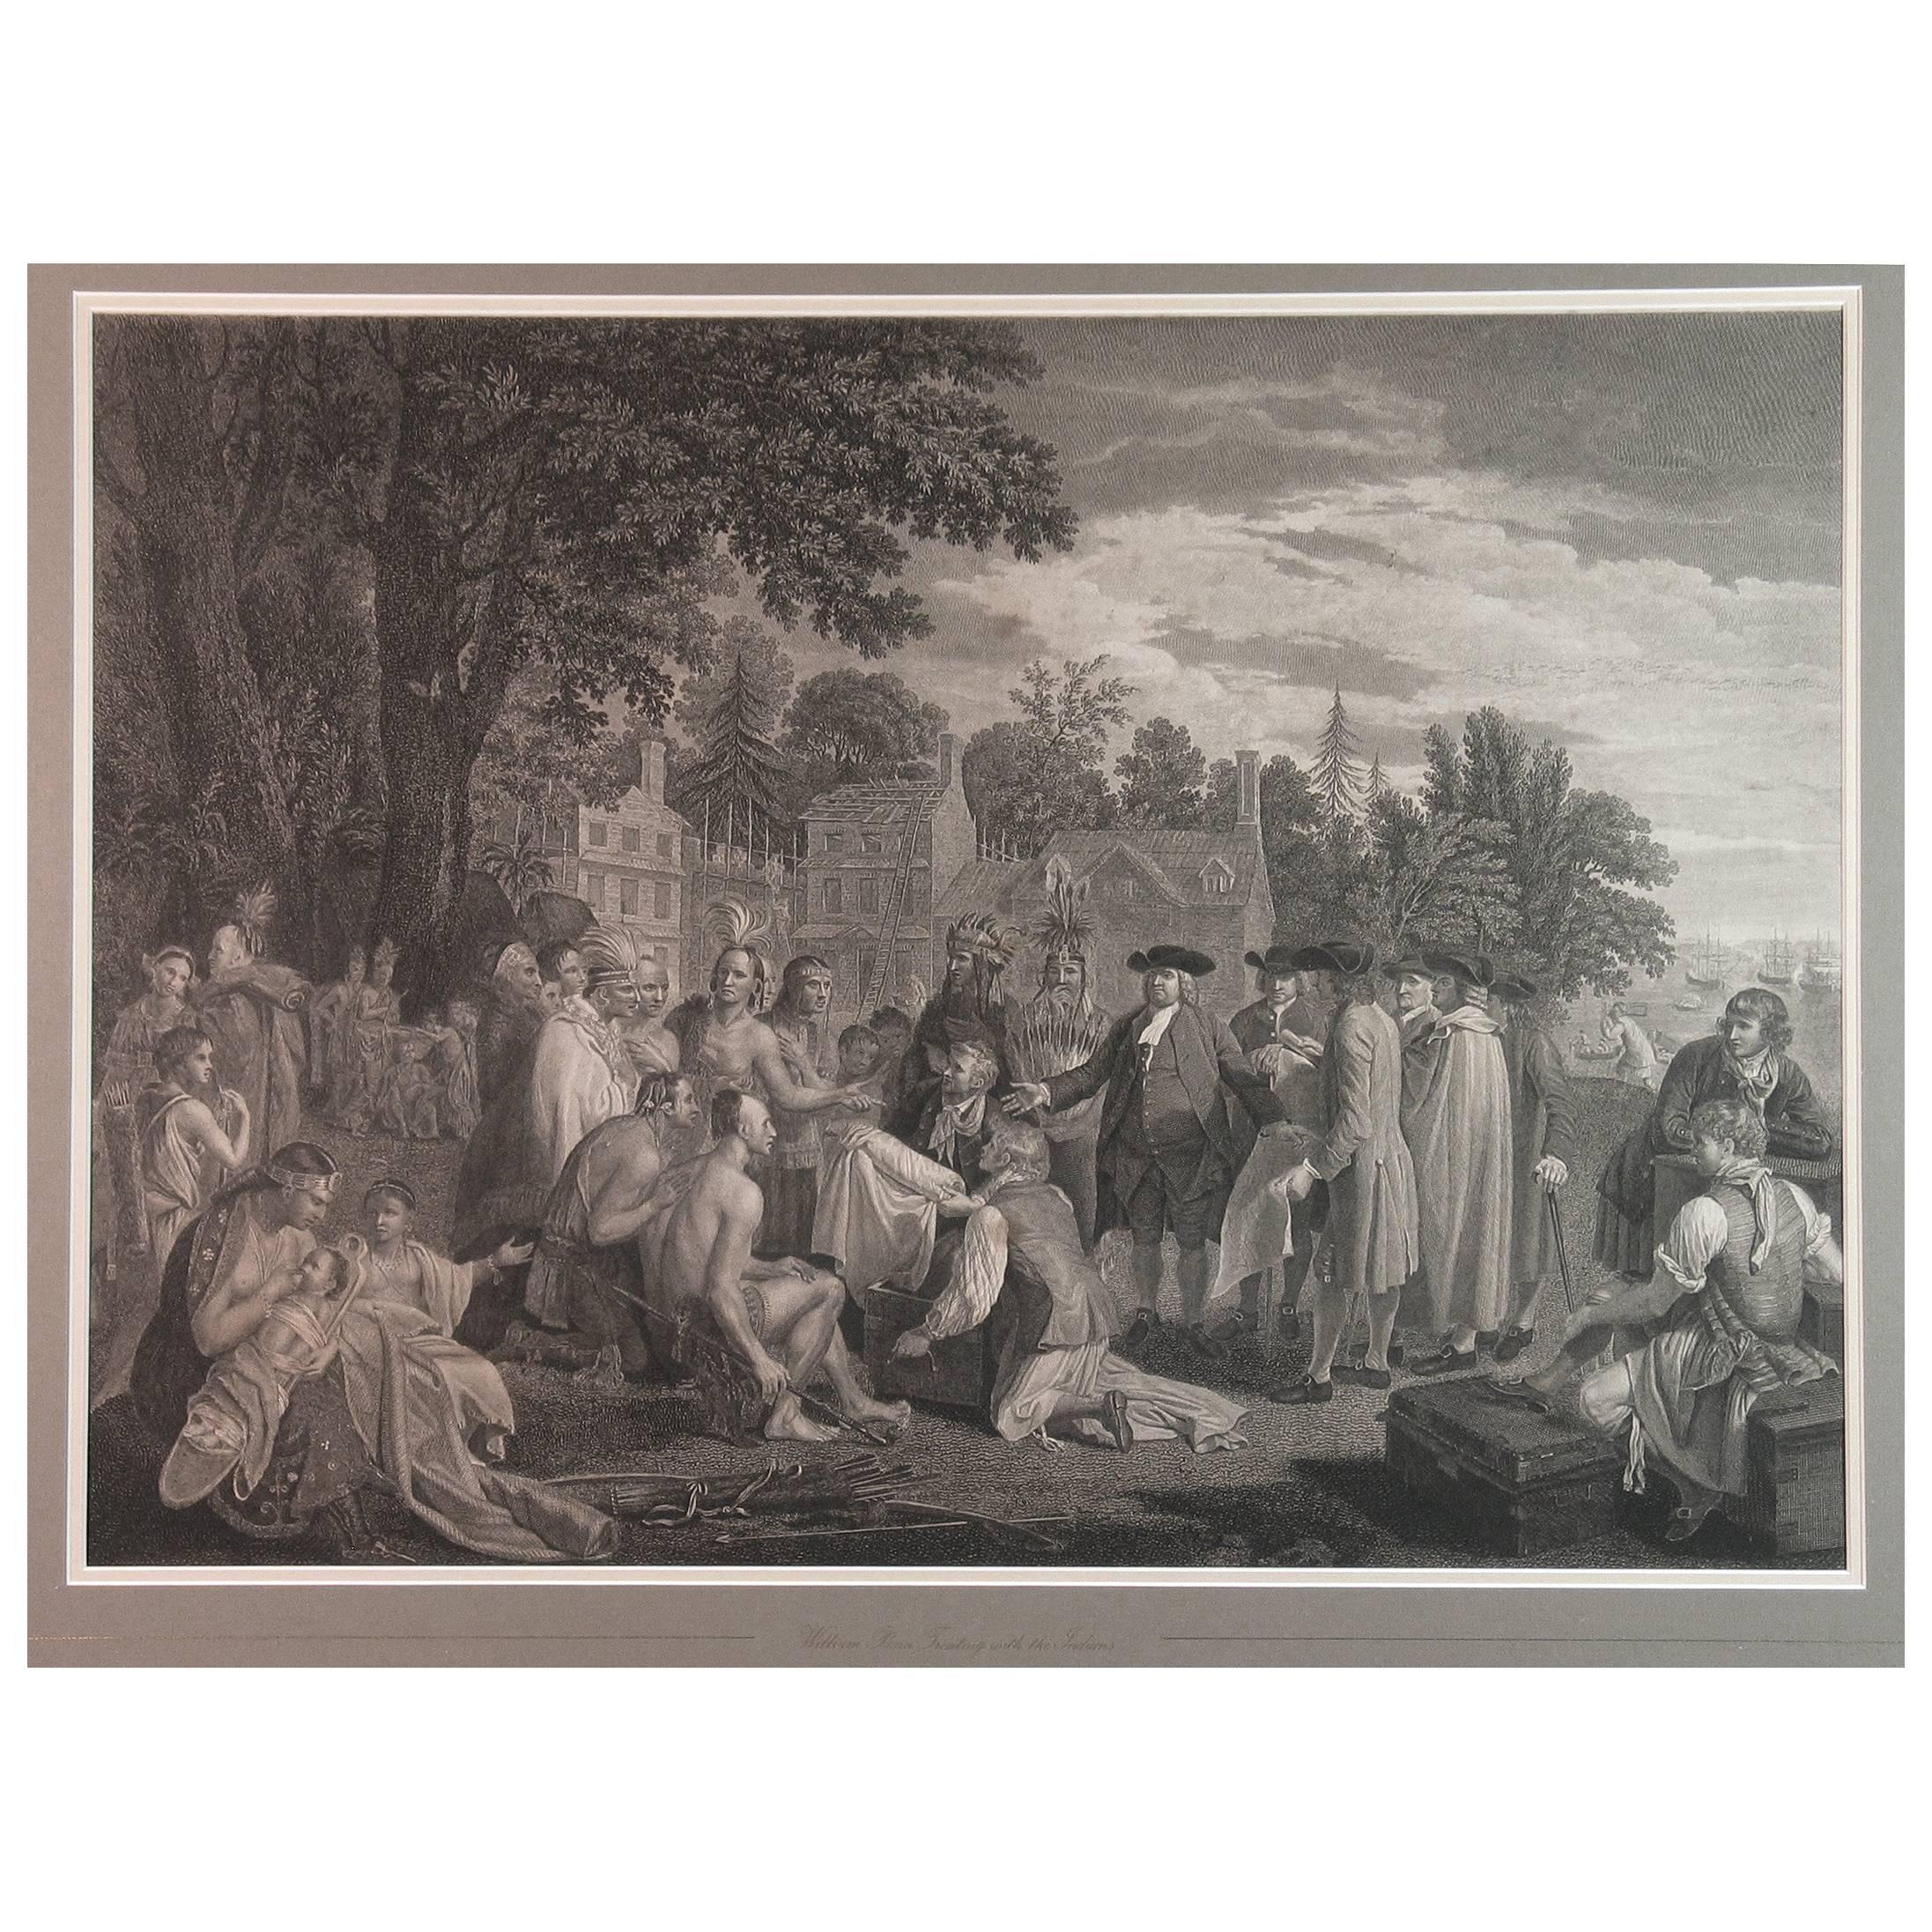 William Penn's Treaty, Pennsylvania, Engraving, London, 1775